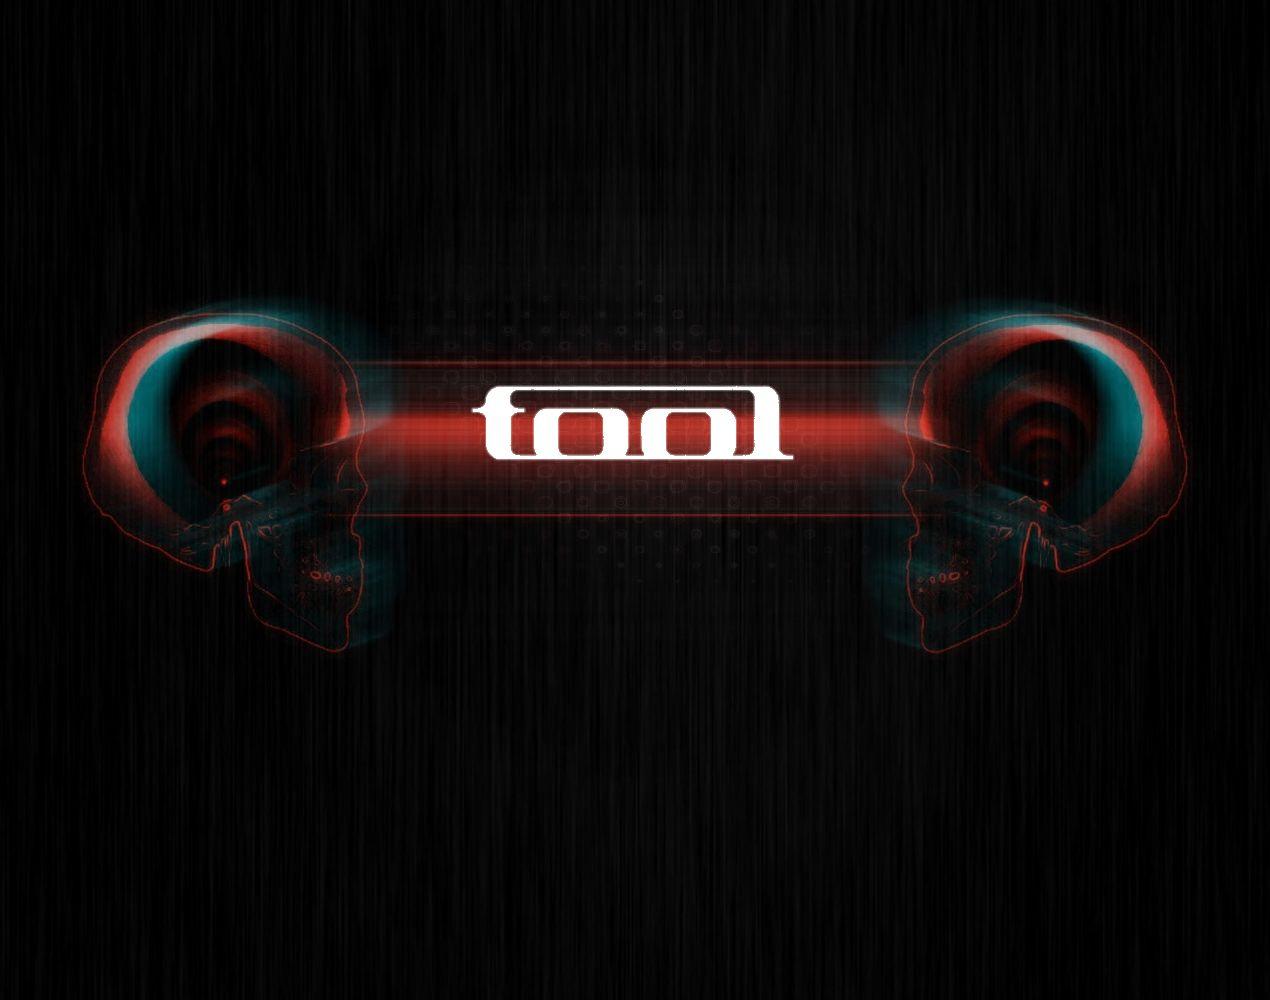 Tool Wallpaper 2 By Lateralust Jpg 1270 1000 Wallpaper Tools Tool Band Tool Band Logo